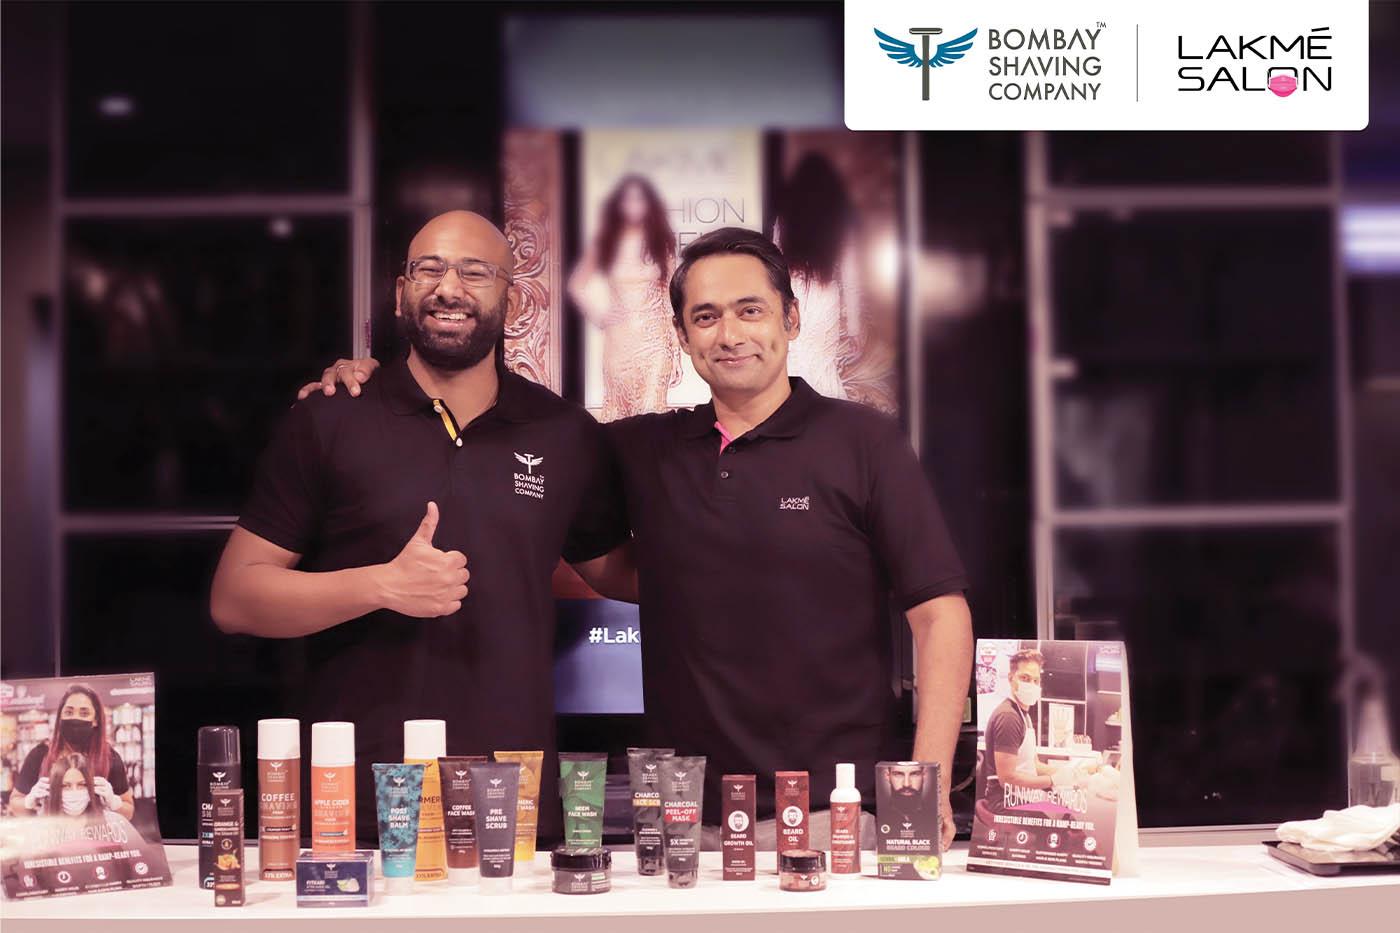 Lakmé Salon's exclusive partnership with Bombay Shaving Company opens doors for men